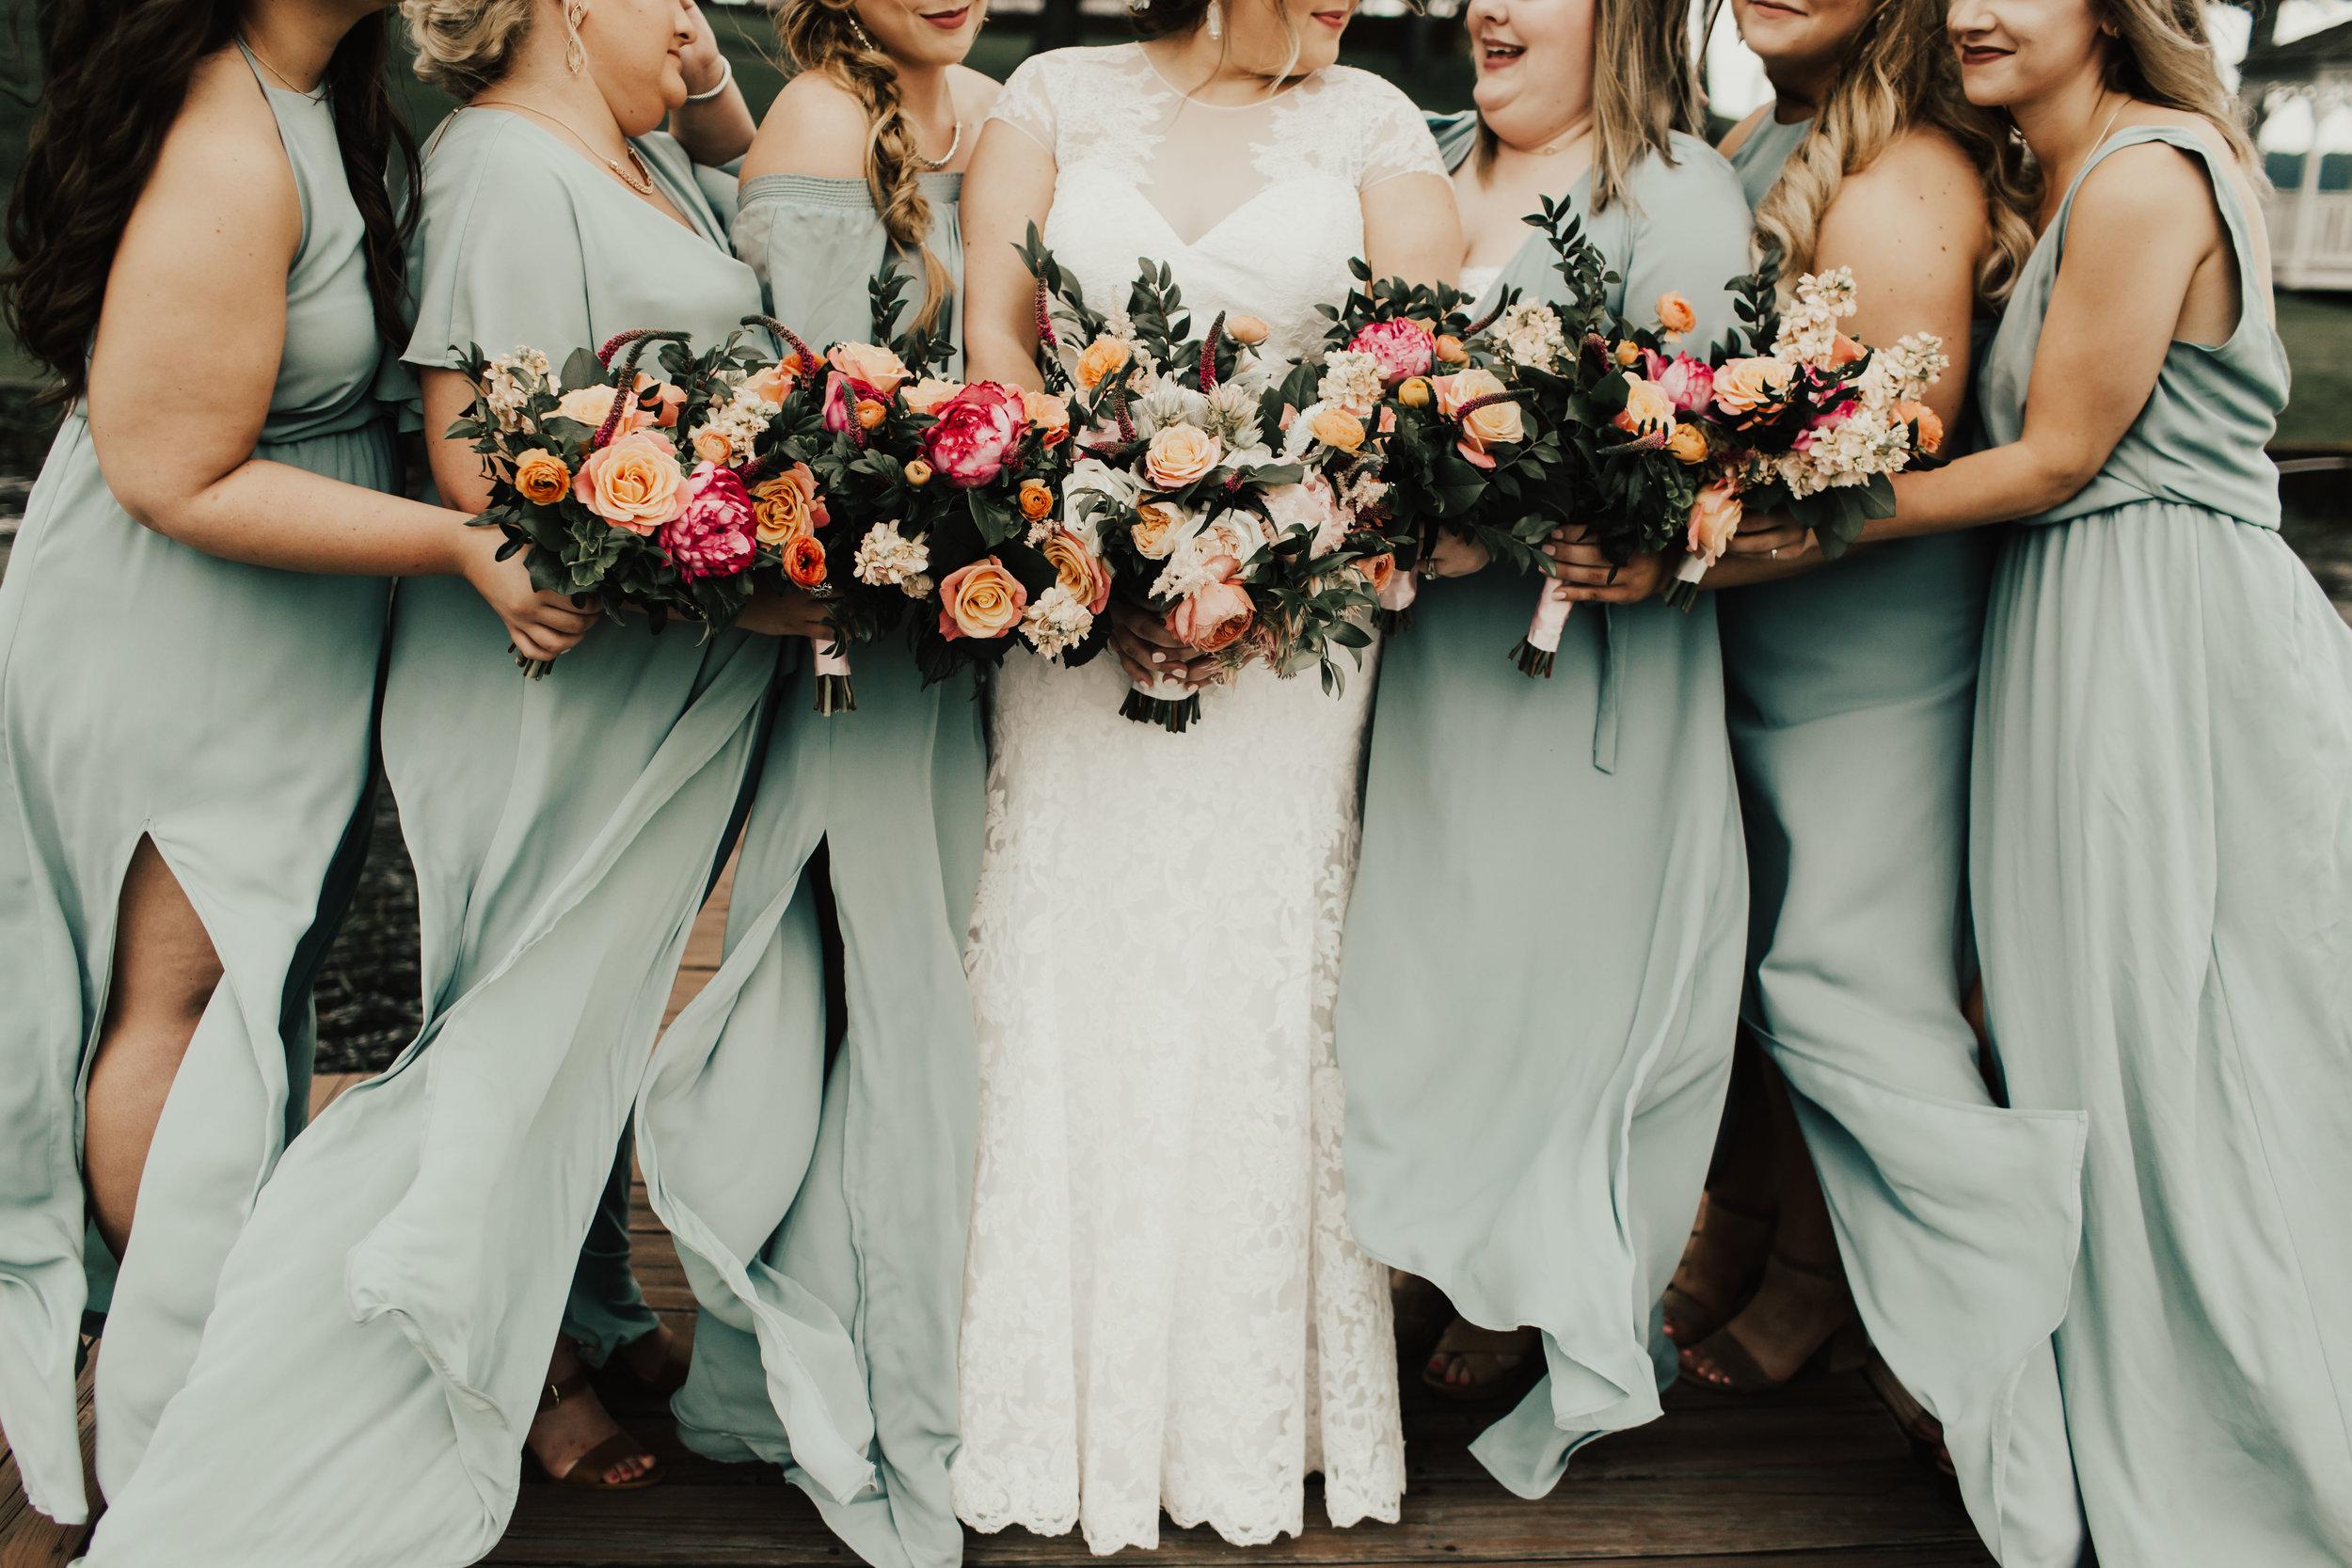 caitlin-jackson-wedding-photographer-lake-tyler-petroleum-club-texas--274.jpg